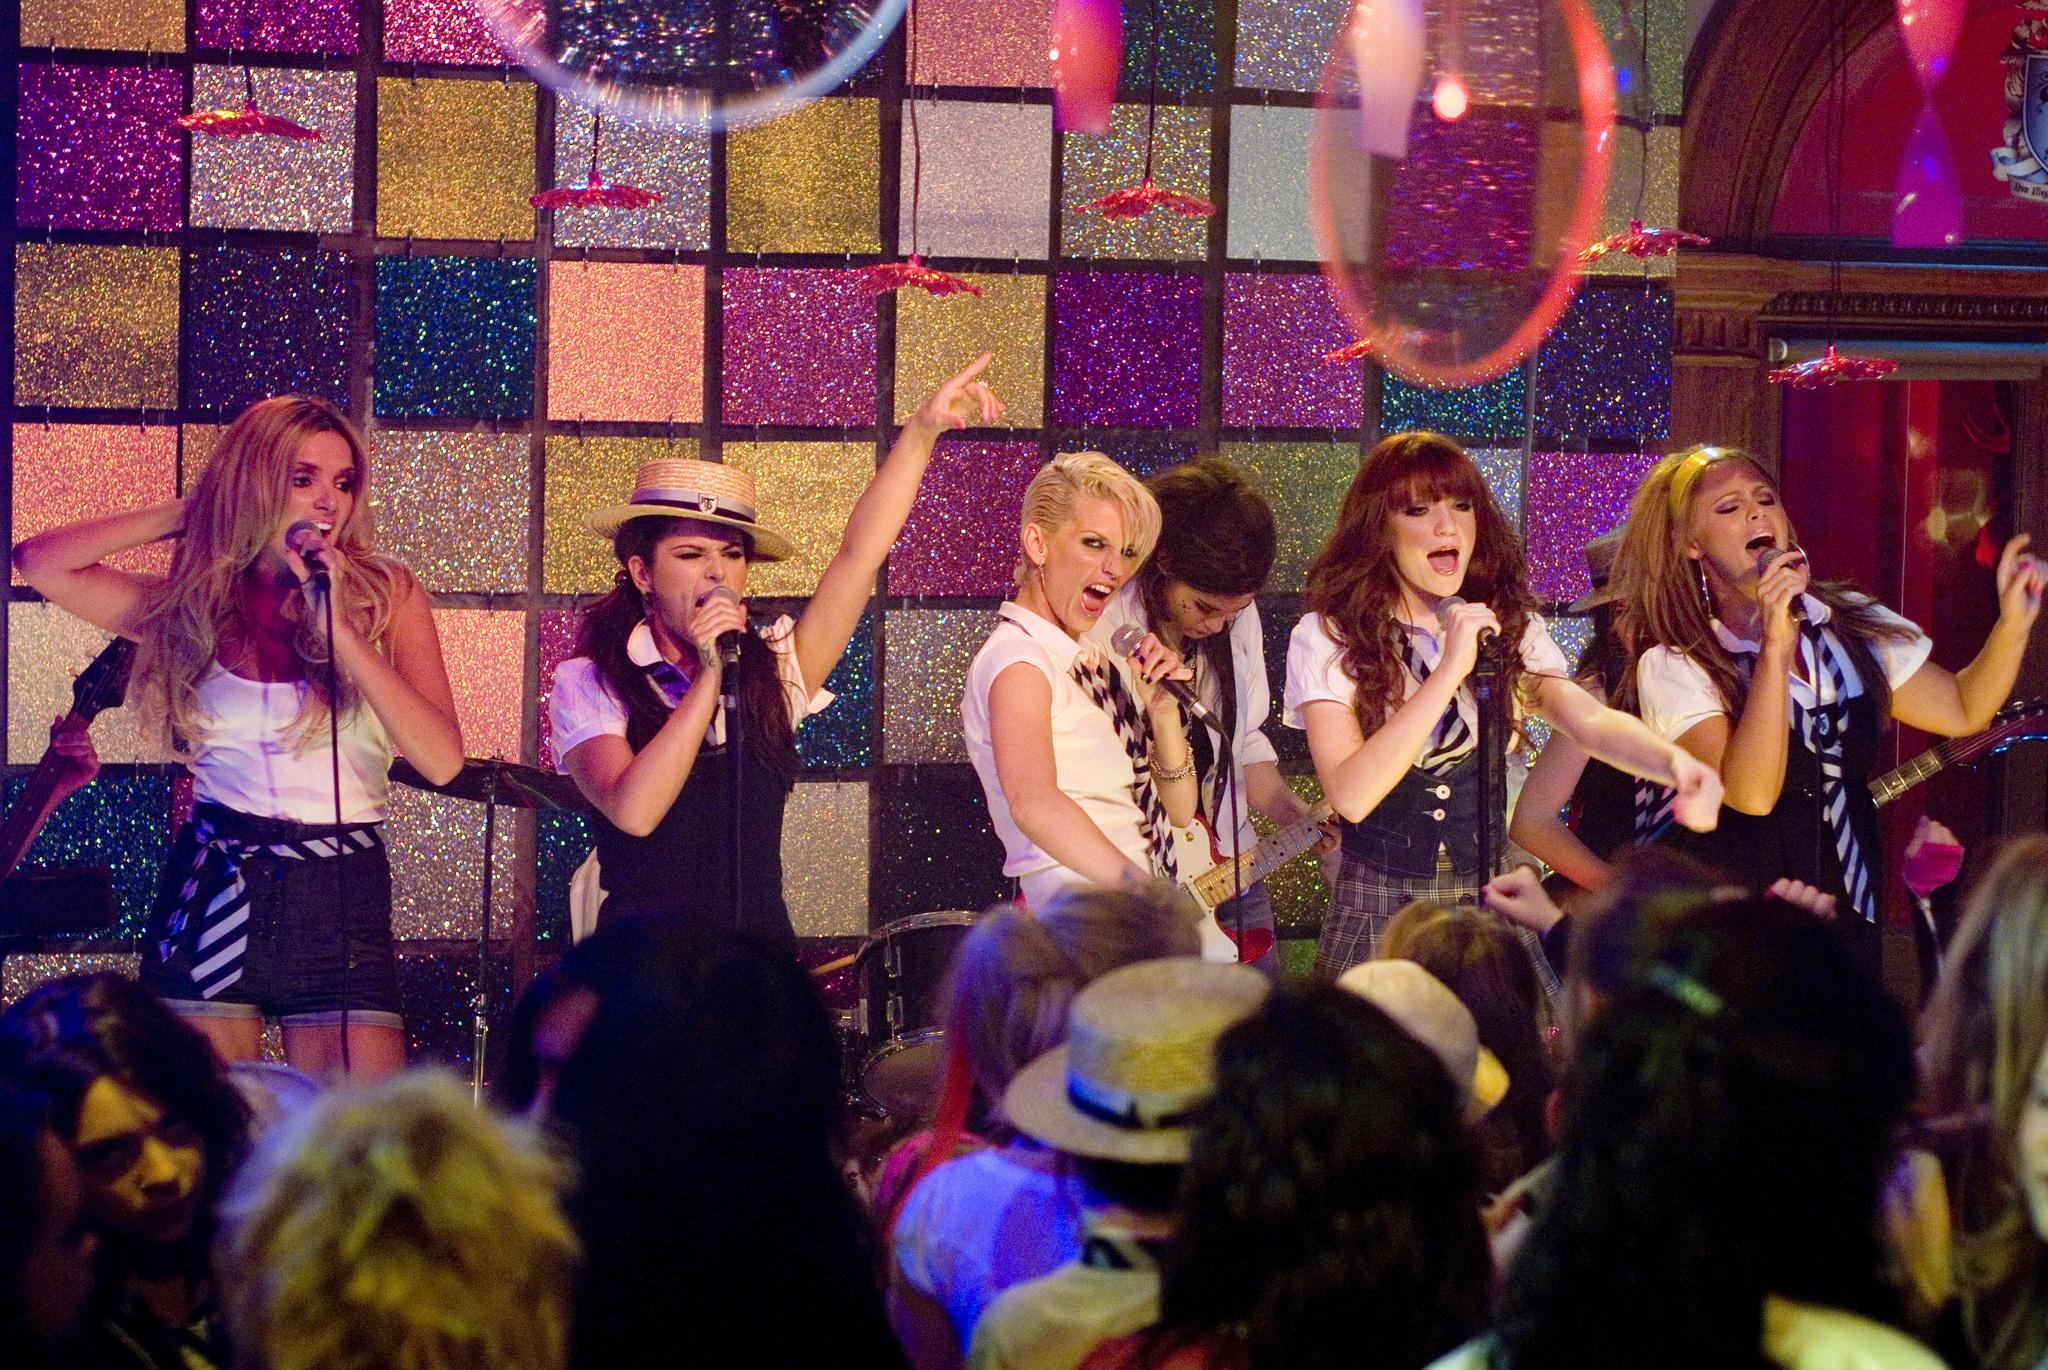 Cheryl, Kimberley Walsh, Nadine Coyle, Sarah Harding, Nicola Roberts, and Girls Aloud in St. Trinian's (2007)